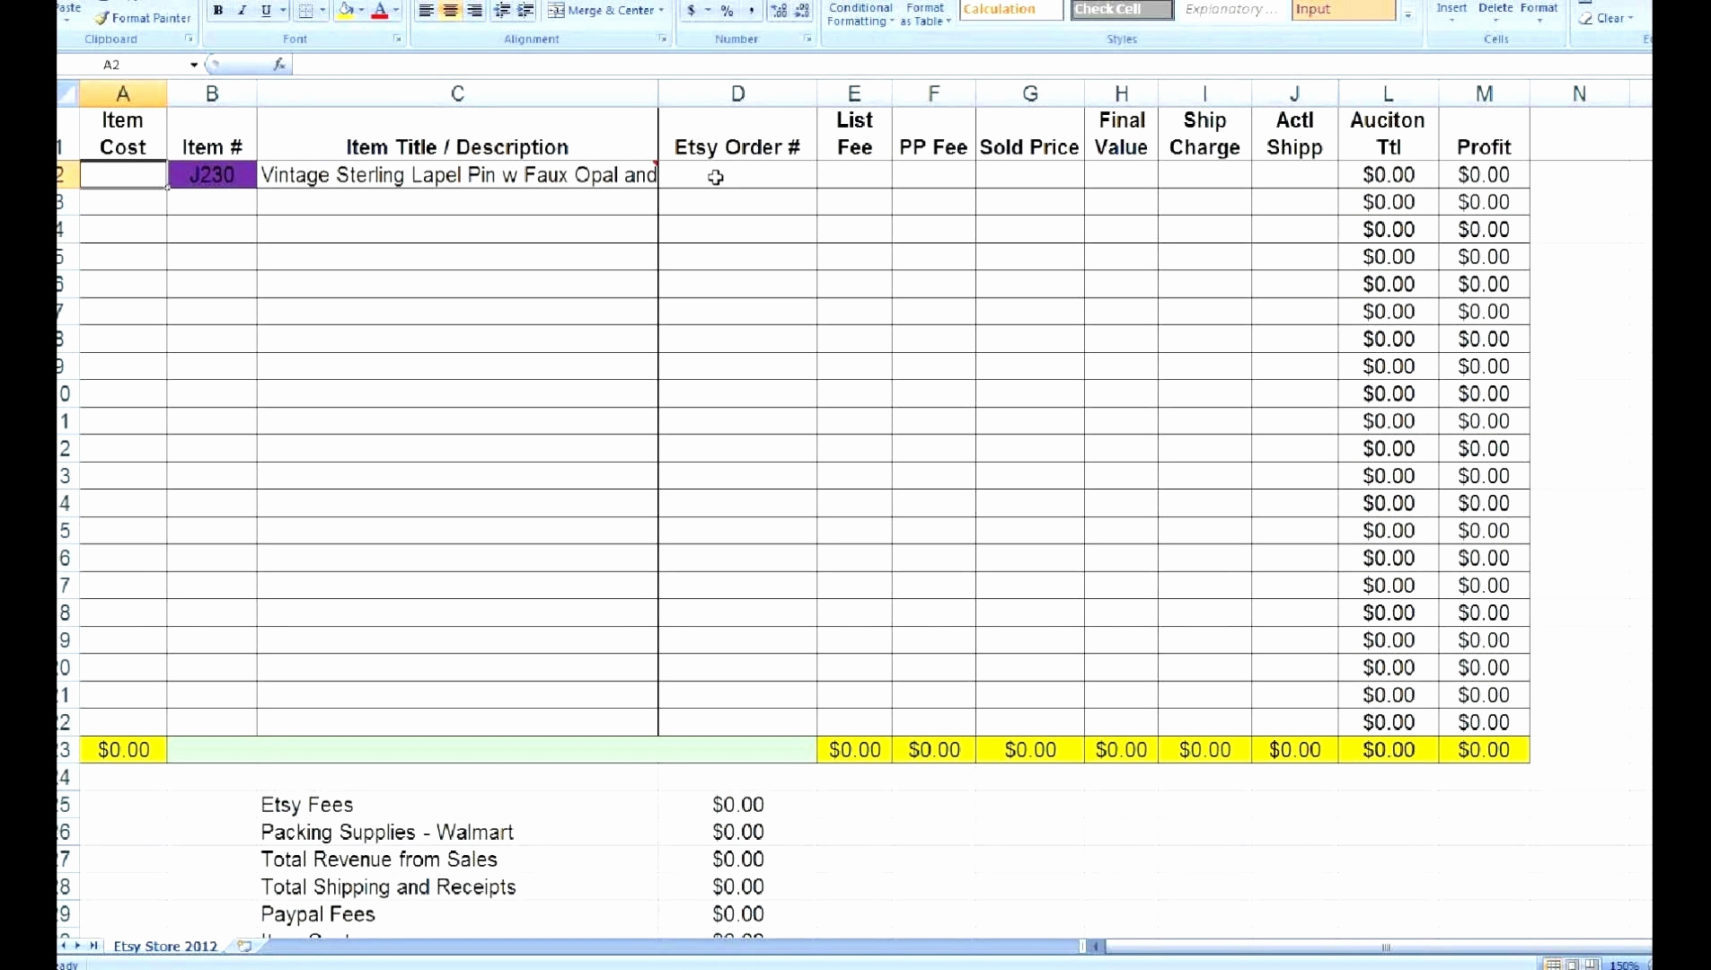 Biggest Loser Weight Loss Calculator Spreadsheet In Example Of Biggest Loser Weight Loss Calculator Spreadsheet